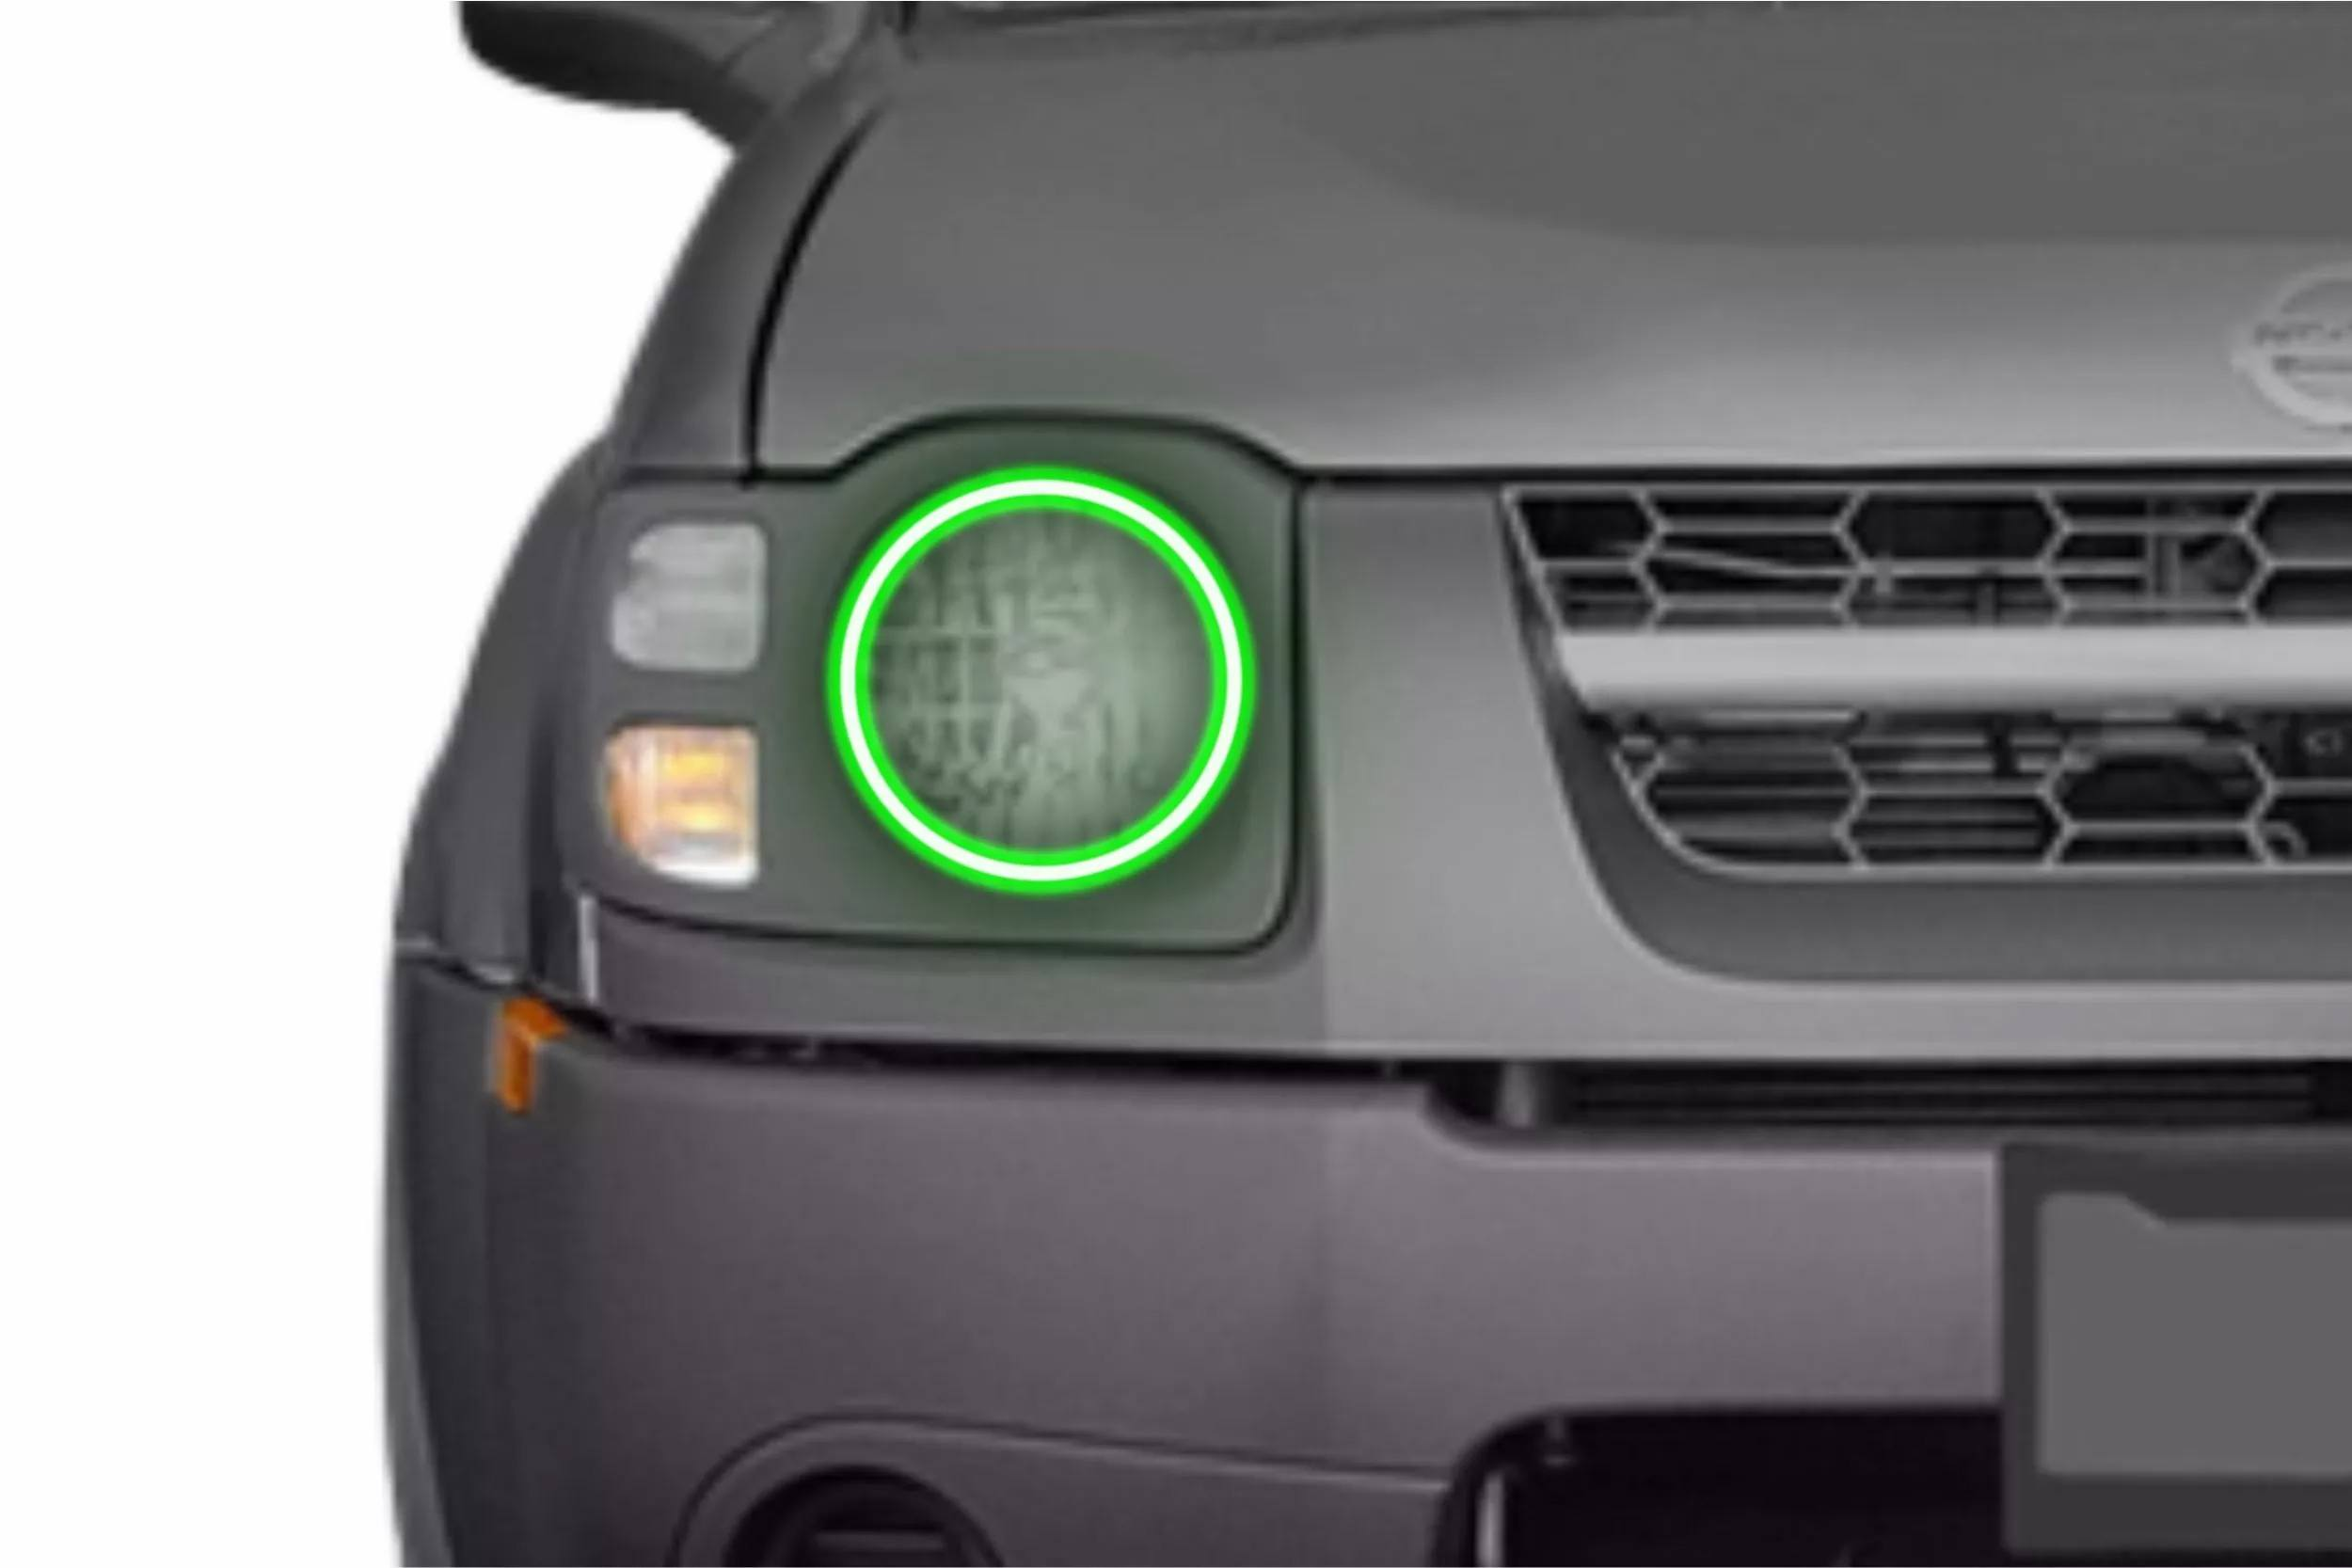 Nissan Xterra (02-04): Profile Prism ed Halos (RGB) on